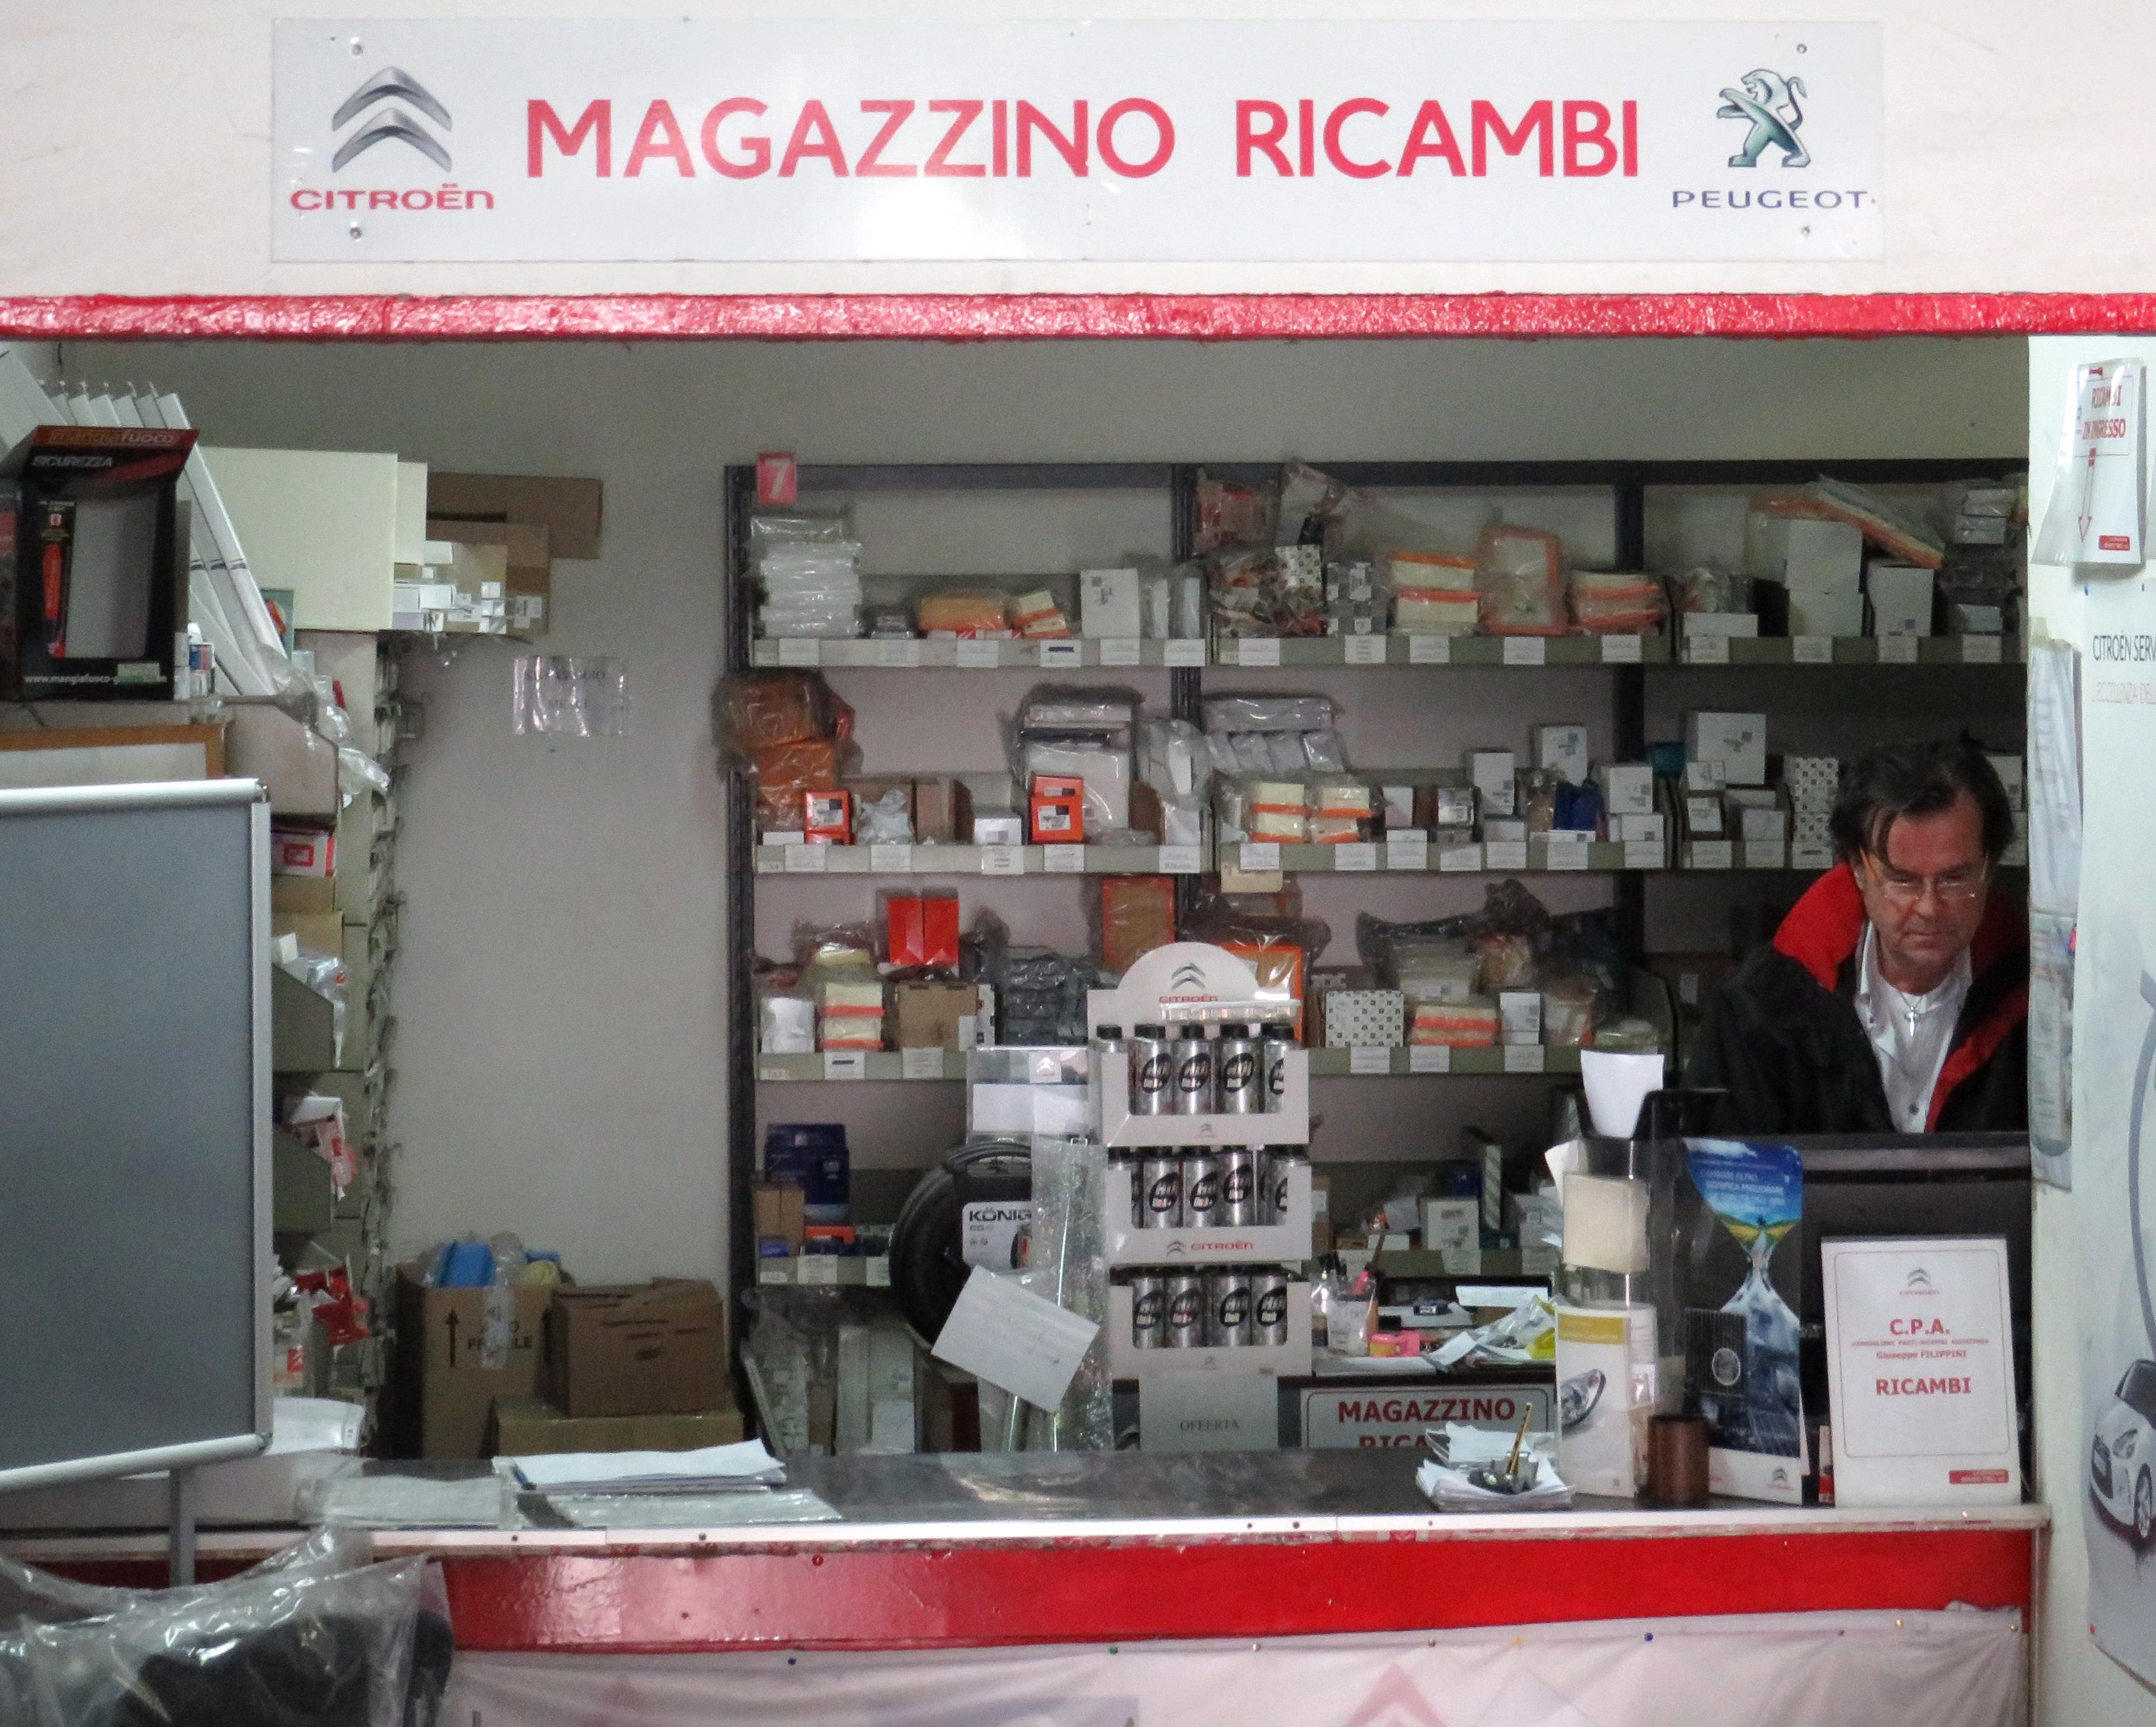 Magazzino Ricambi_Bruno Tibo_Roma